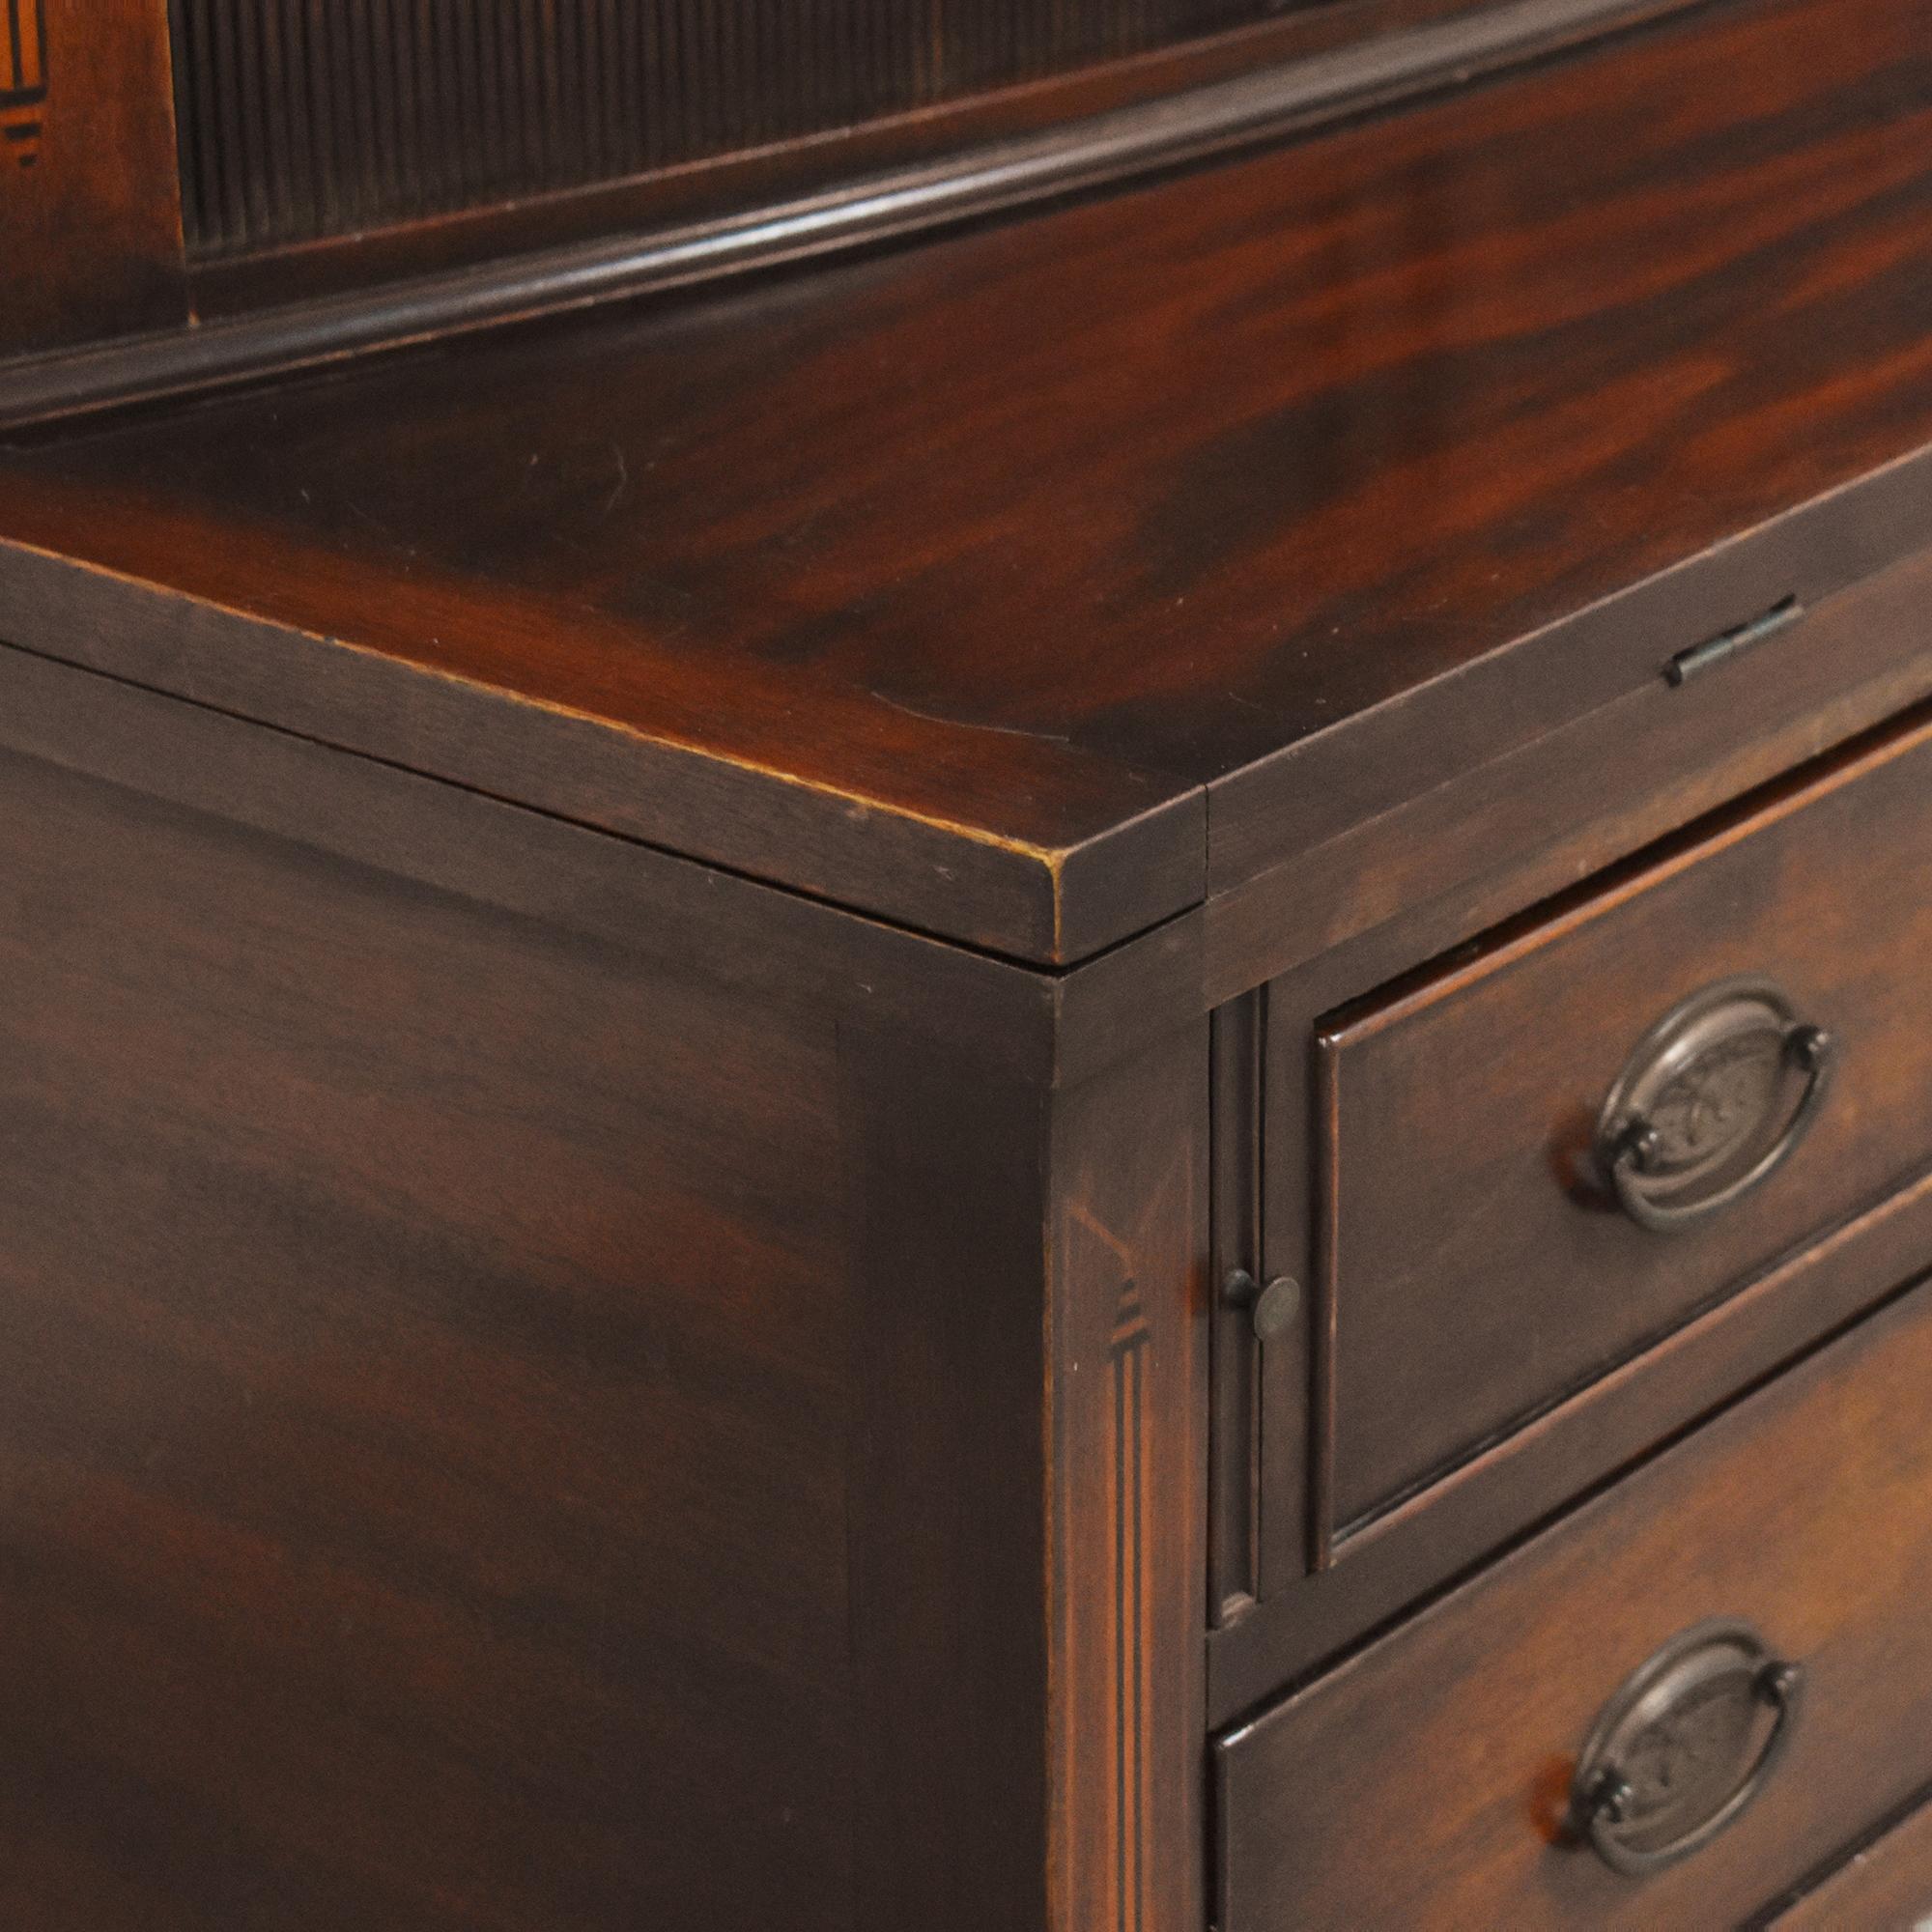 Vintage Hepplewhite-Style Secretary Desk Home Office Desks